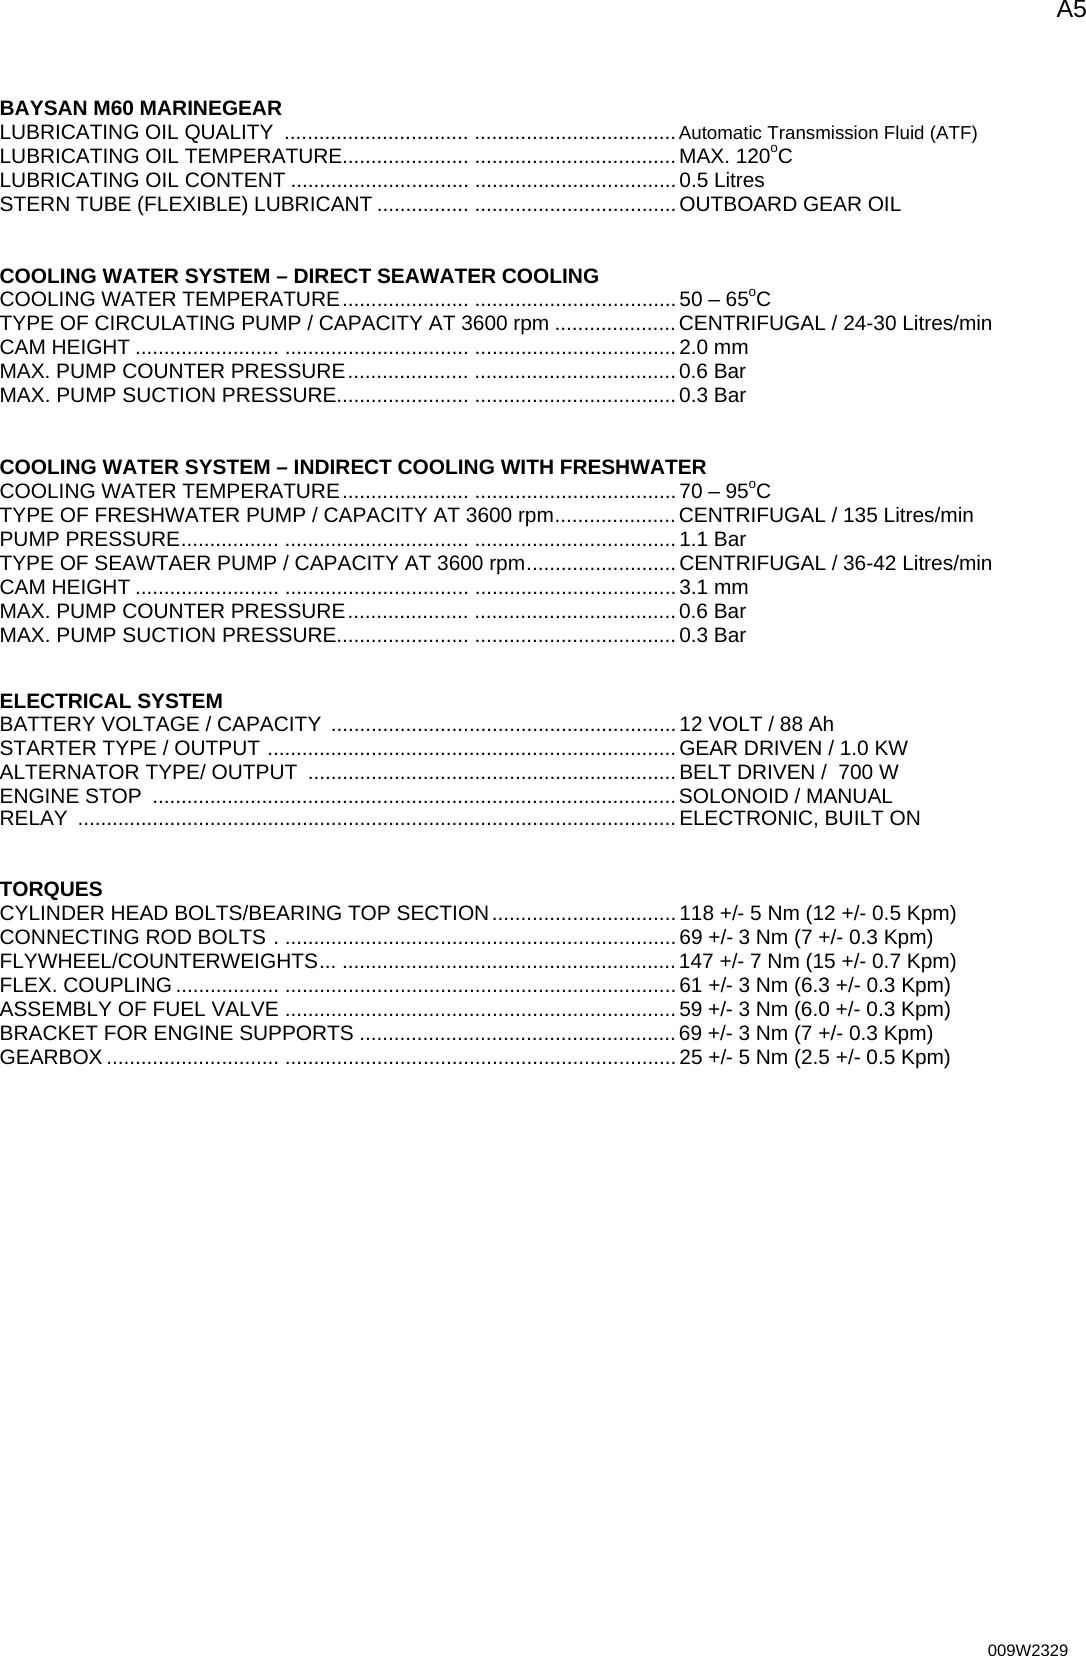 Bukh Dv36 48 Workshop Manual 1003418 009W2329_SECTION Any User